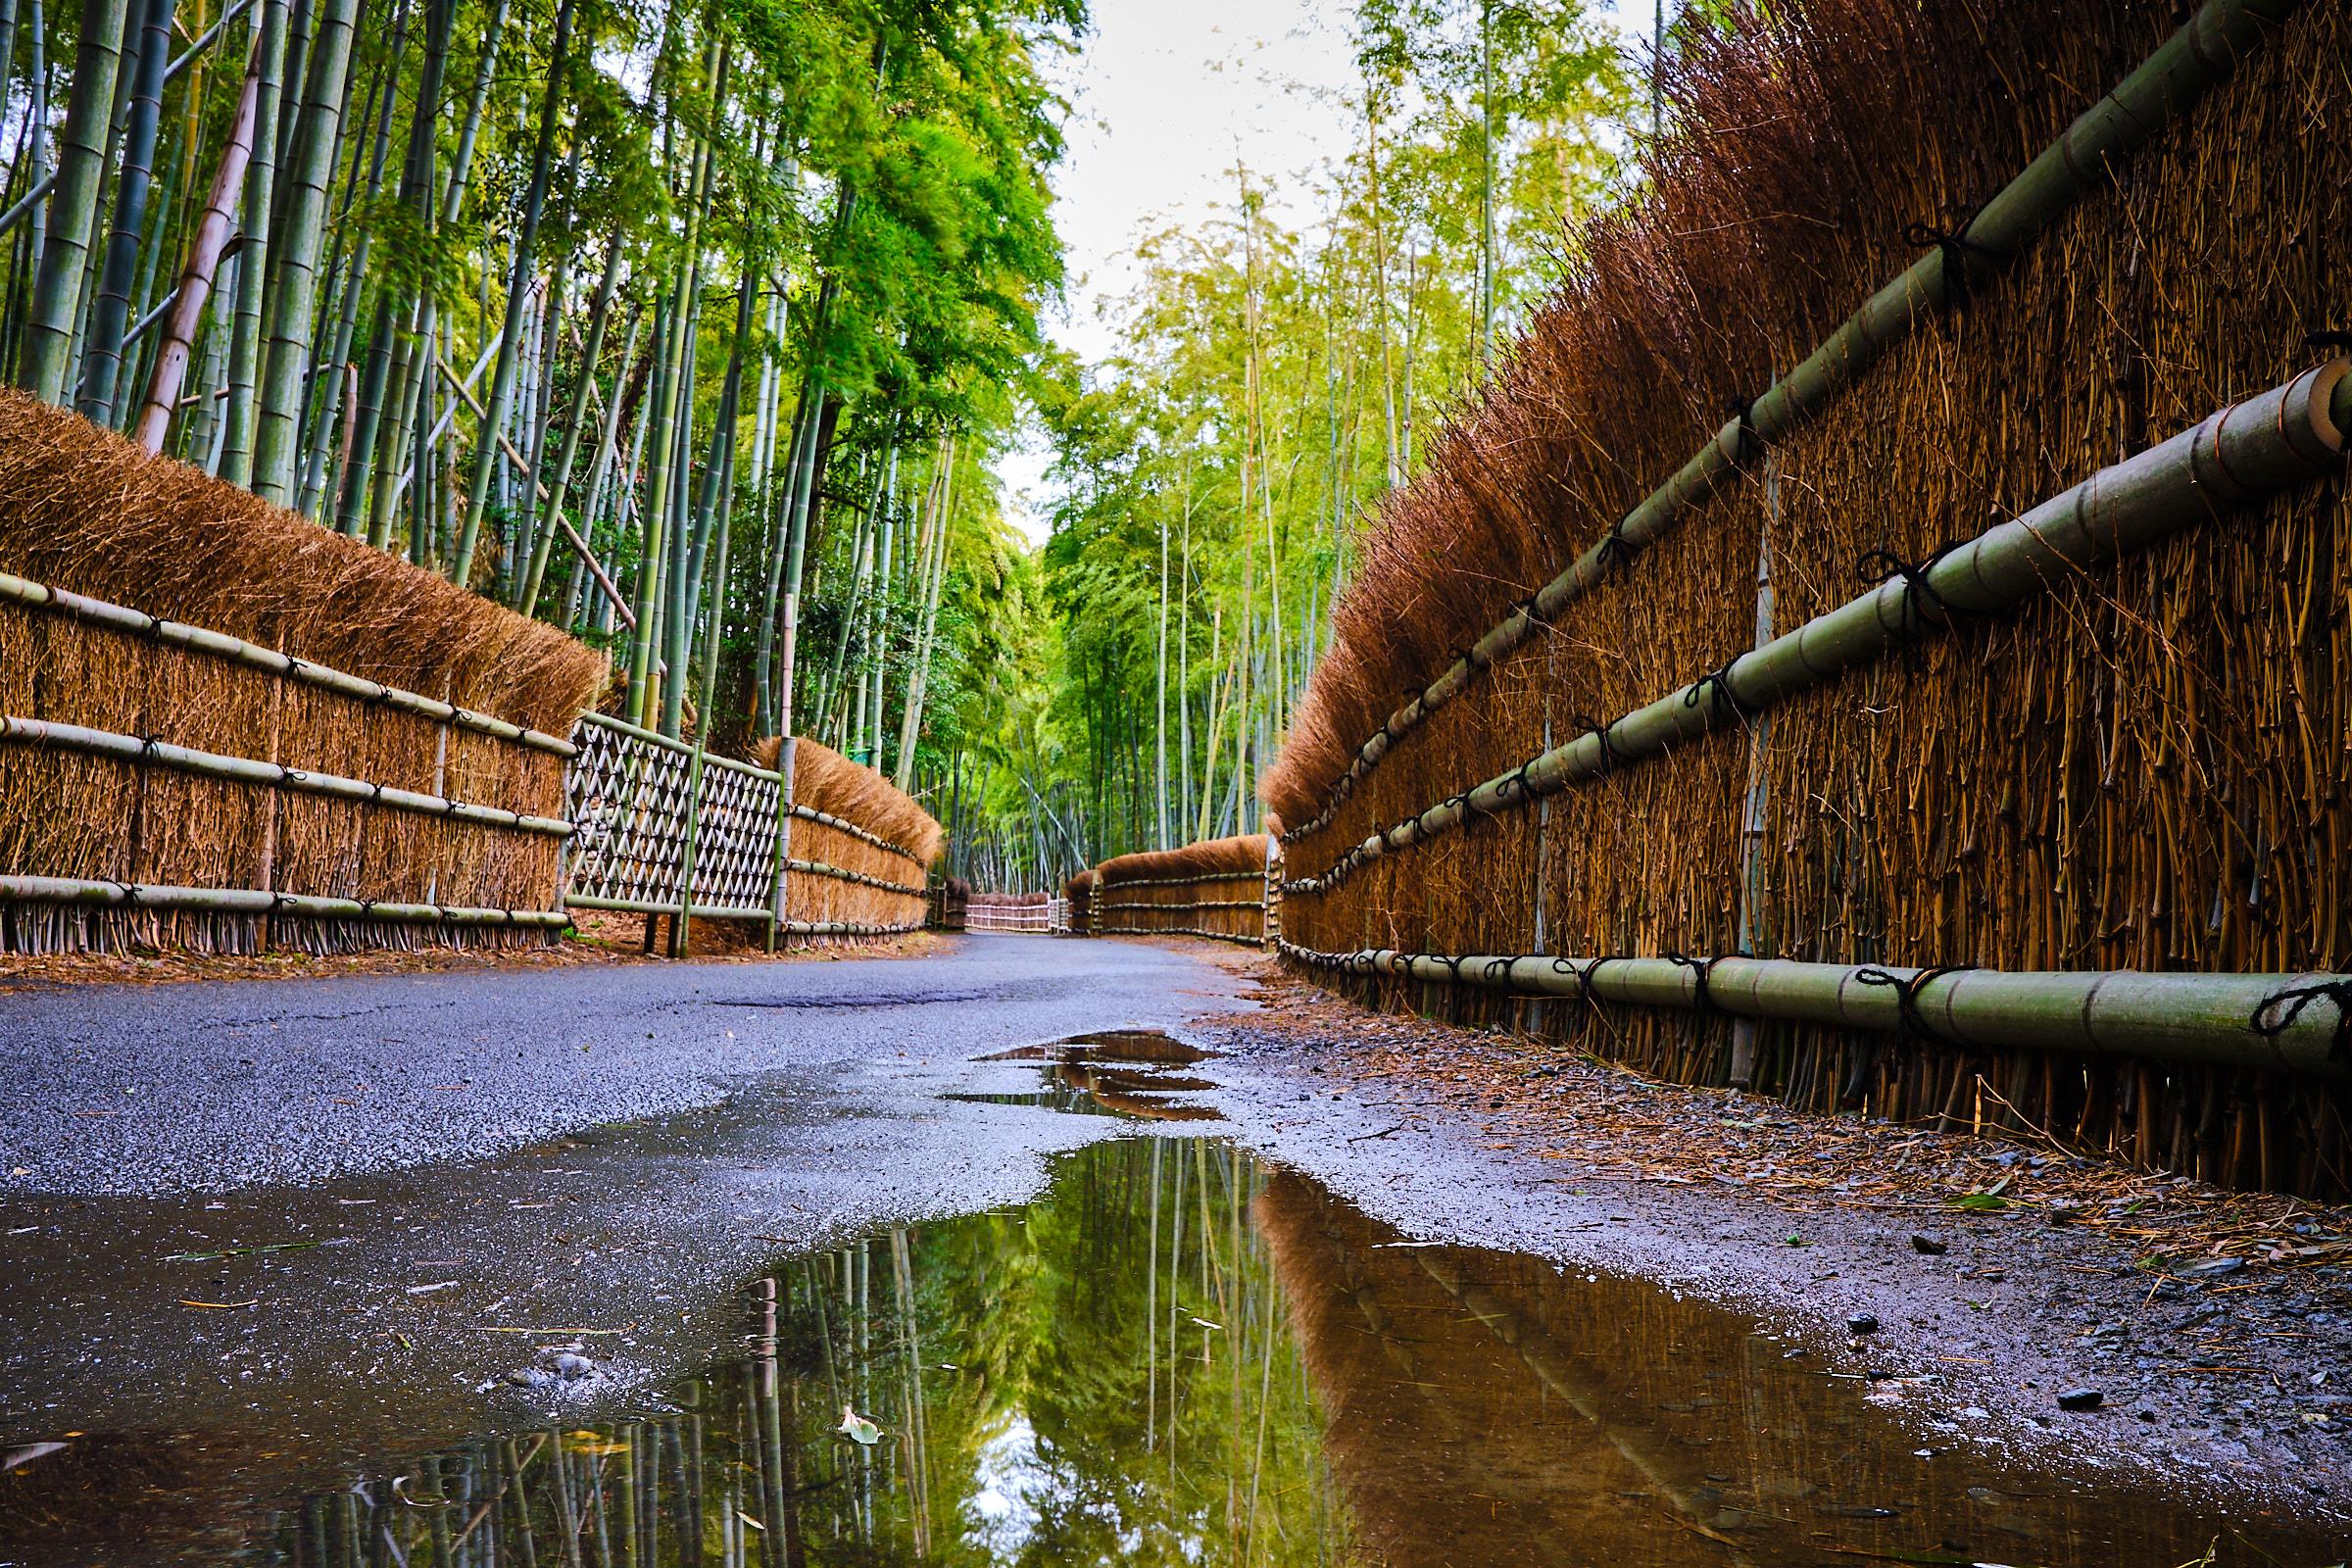 Kyotoshi Rakusaichikurin Park